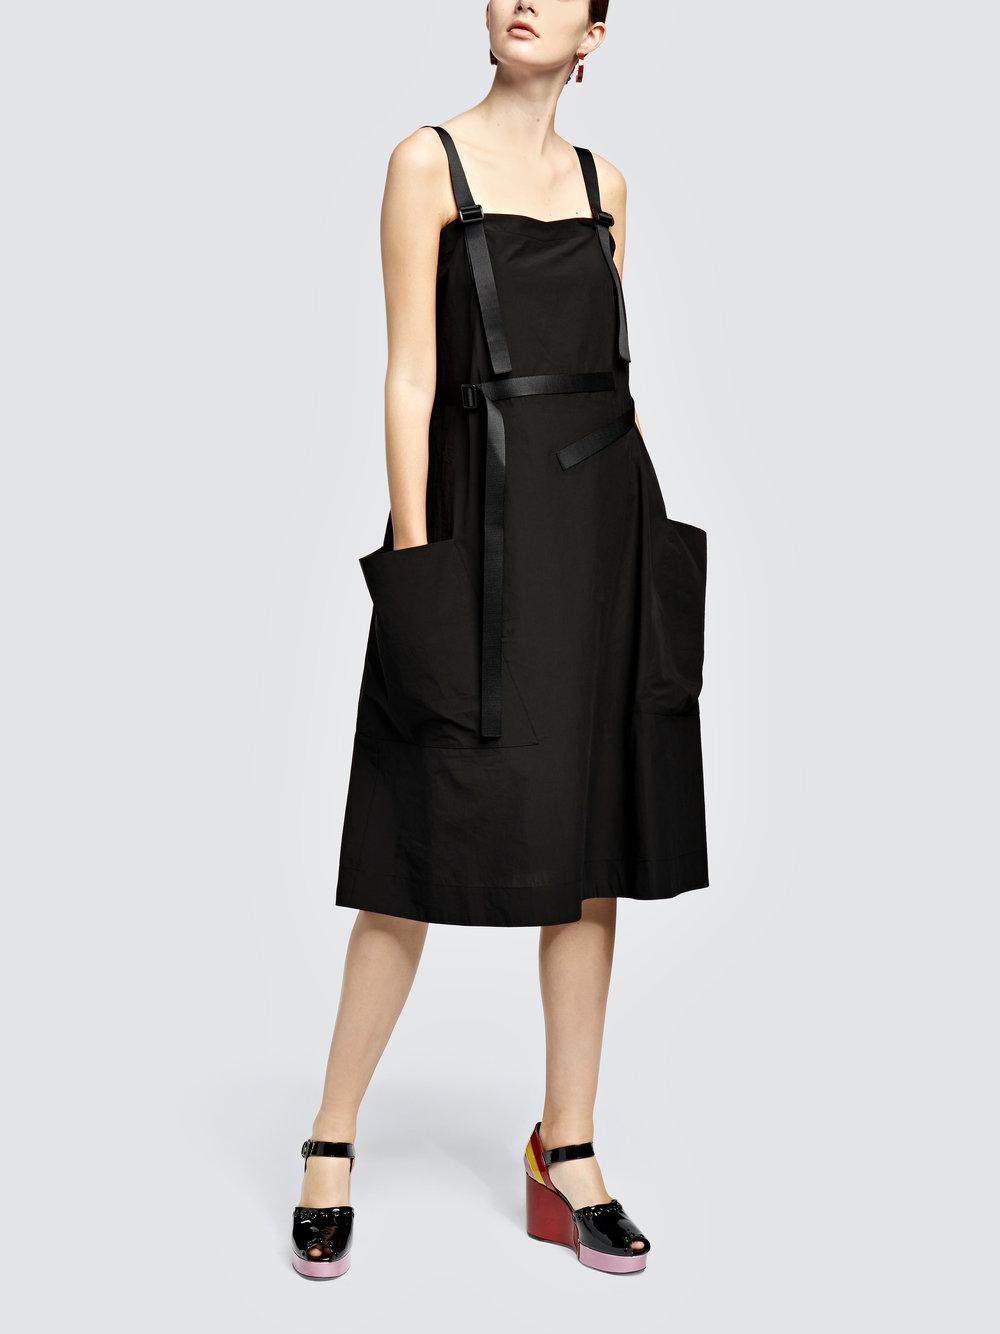 Cotton-poplin Dress - Black Tomas Maier fi7N6UC